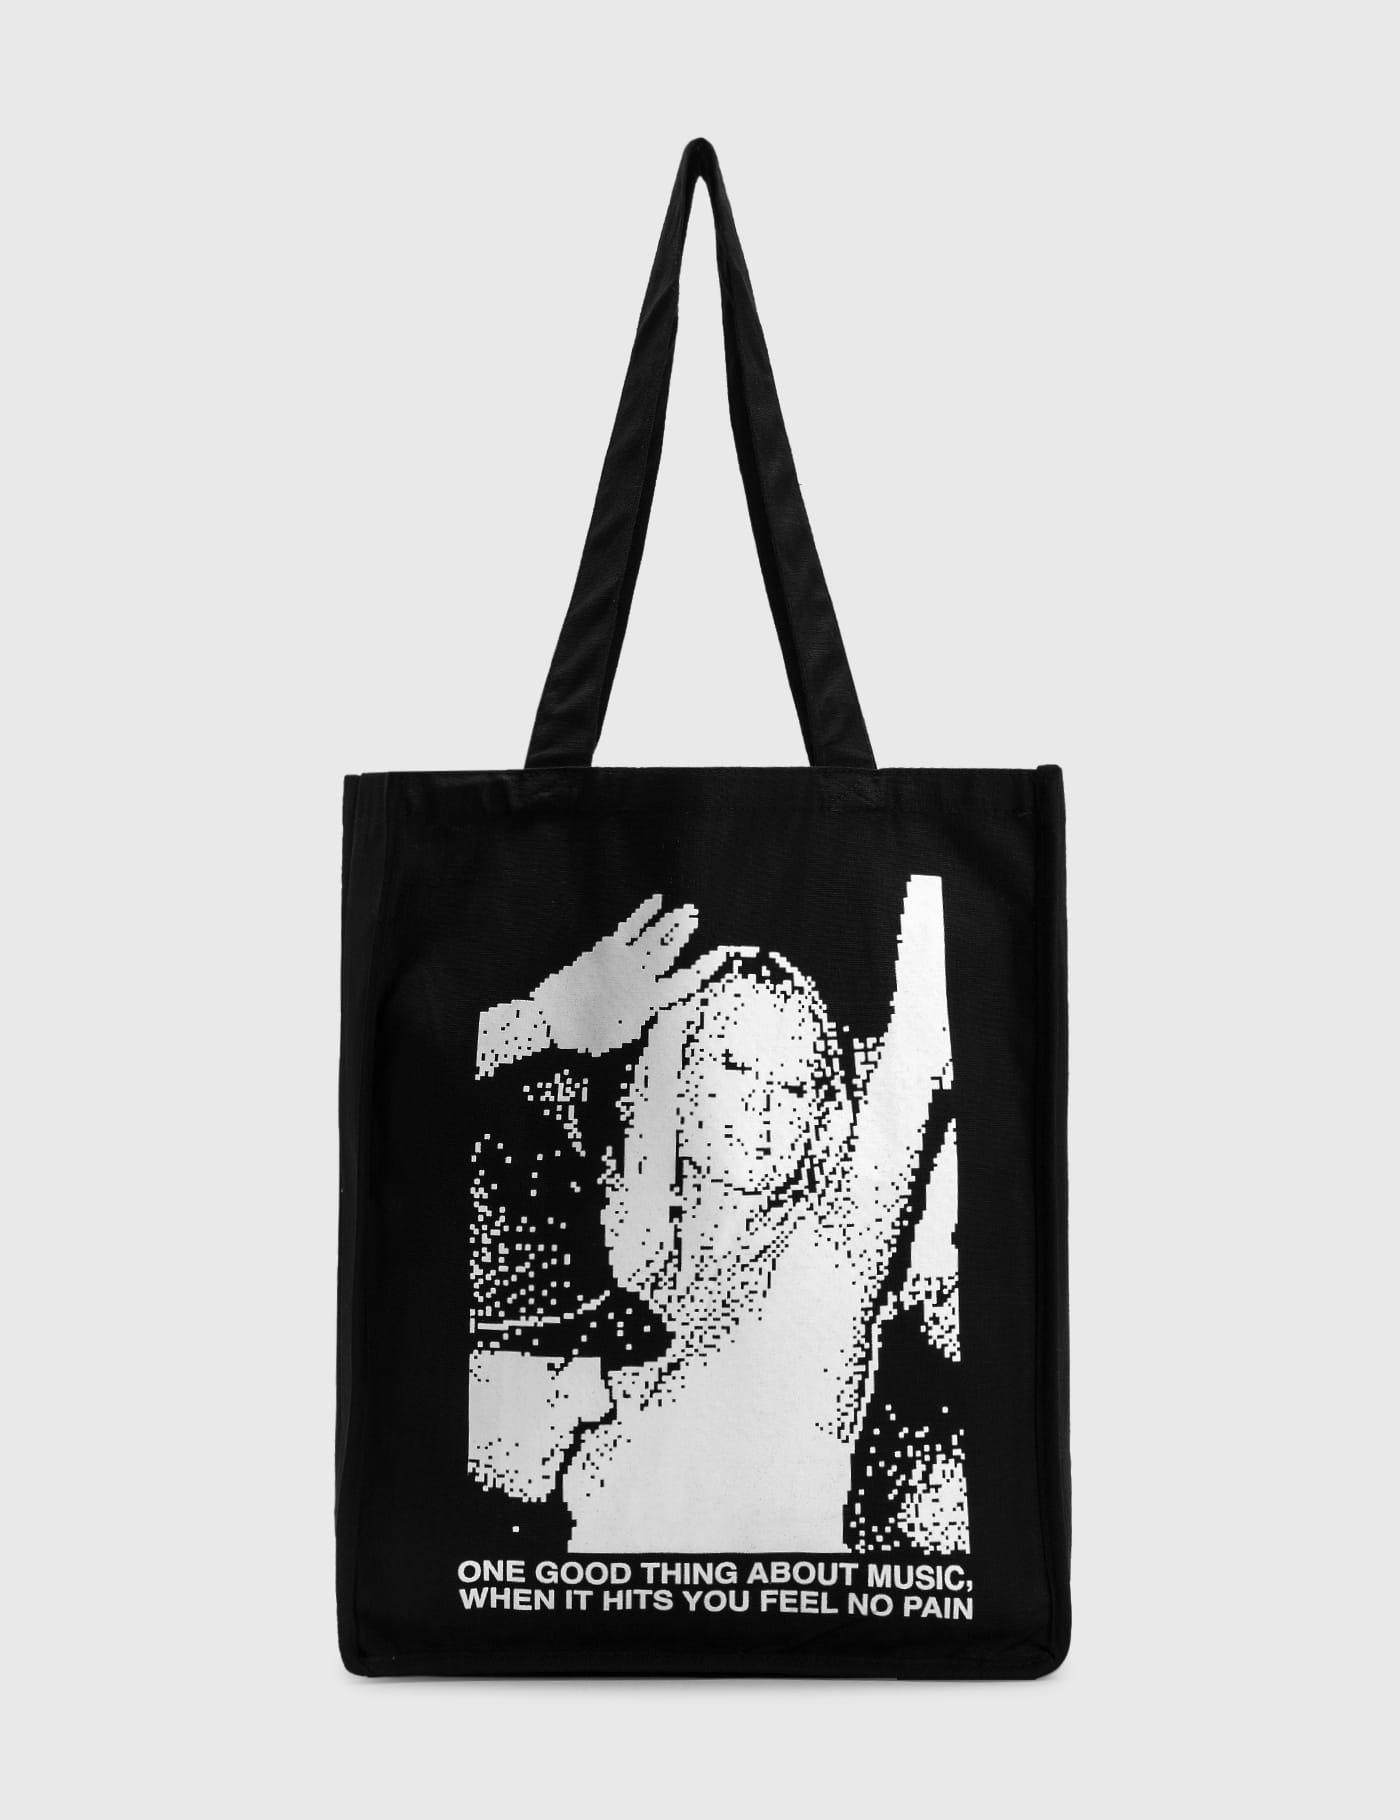 One Night Tote Bag